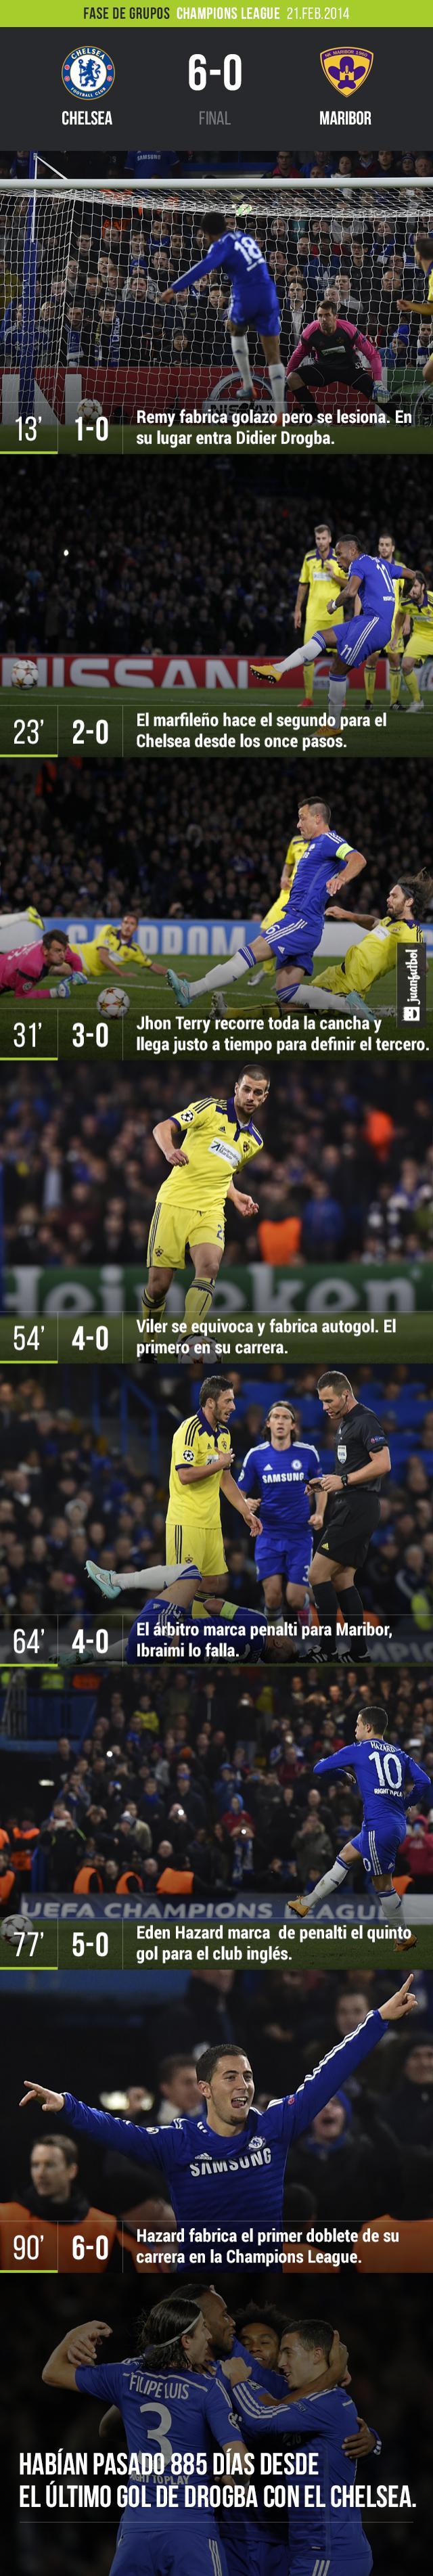 Chelsea vs Maribor